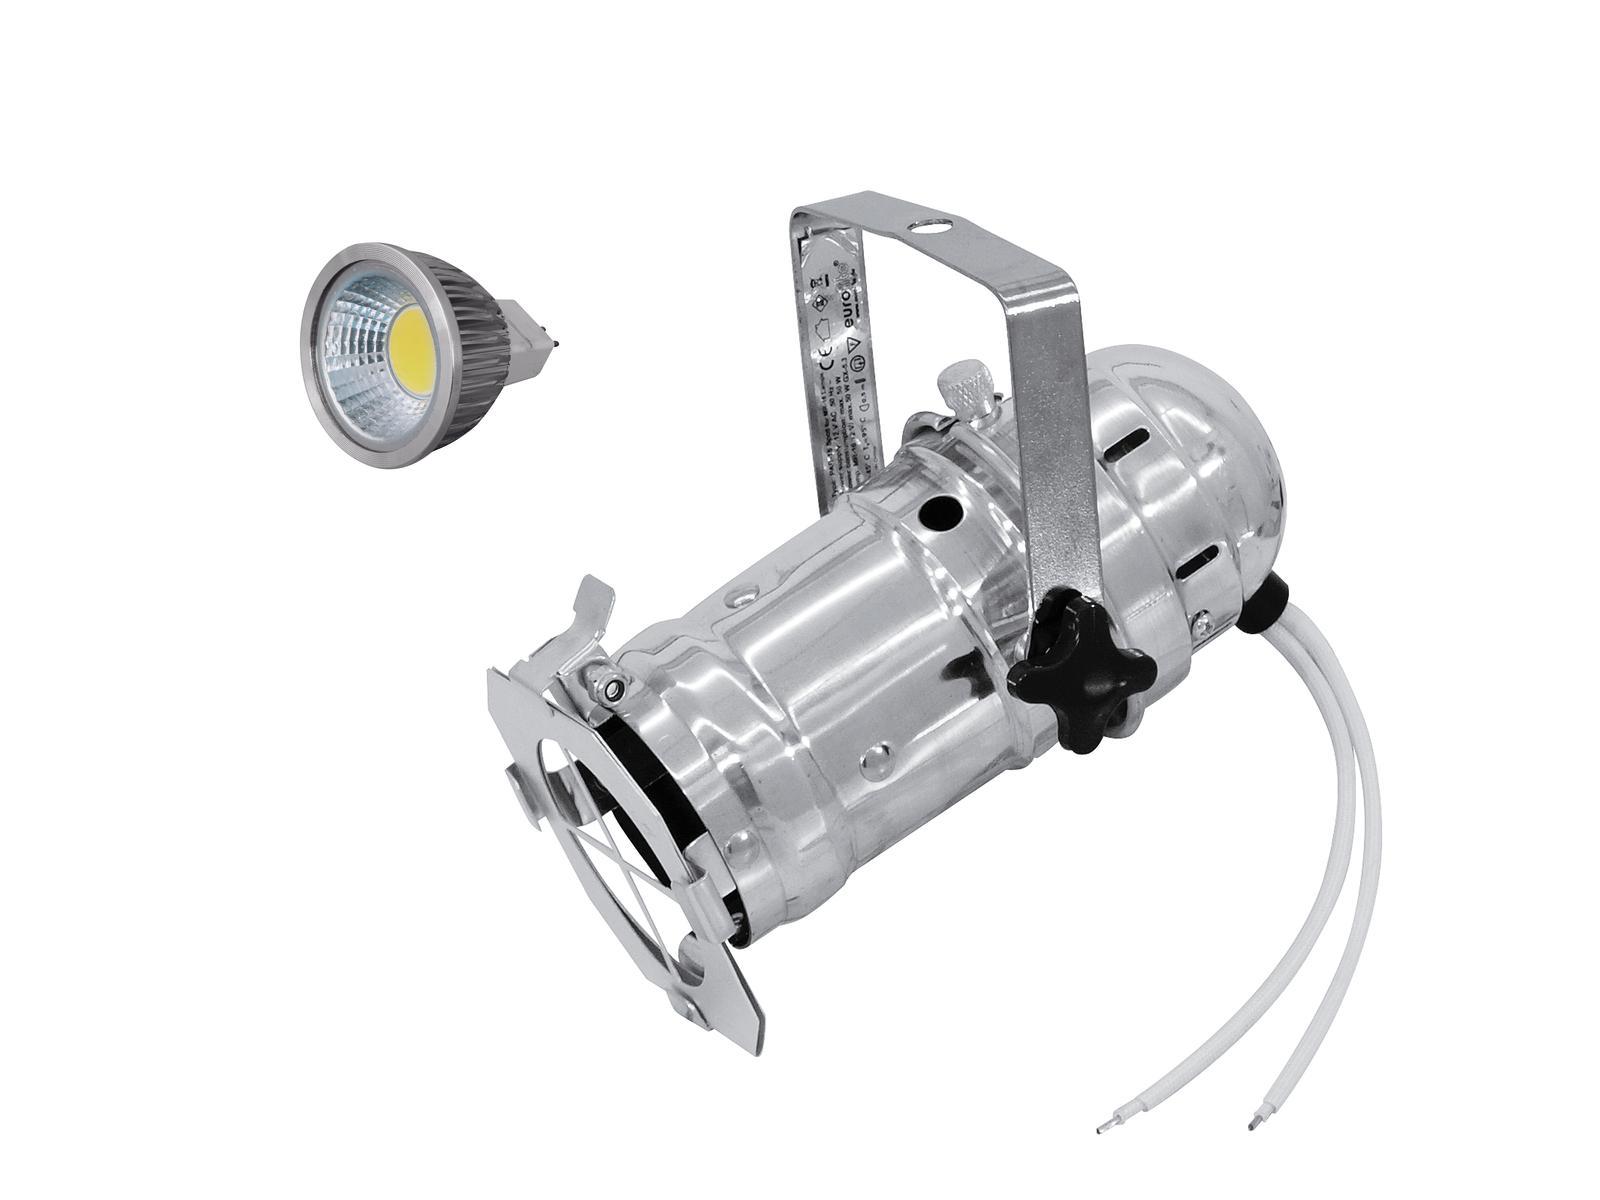 EUROLITE Impostare PAR-16 Spot sil + MR-16 12V GX-5,3 5W COB LED 3000K